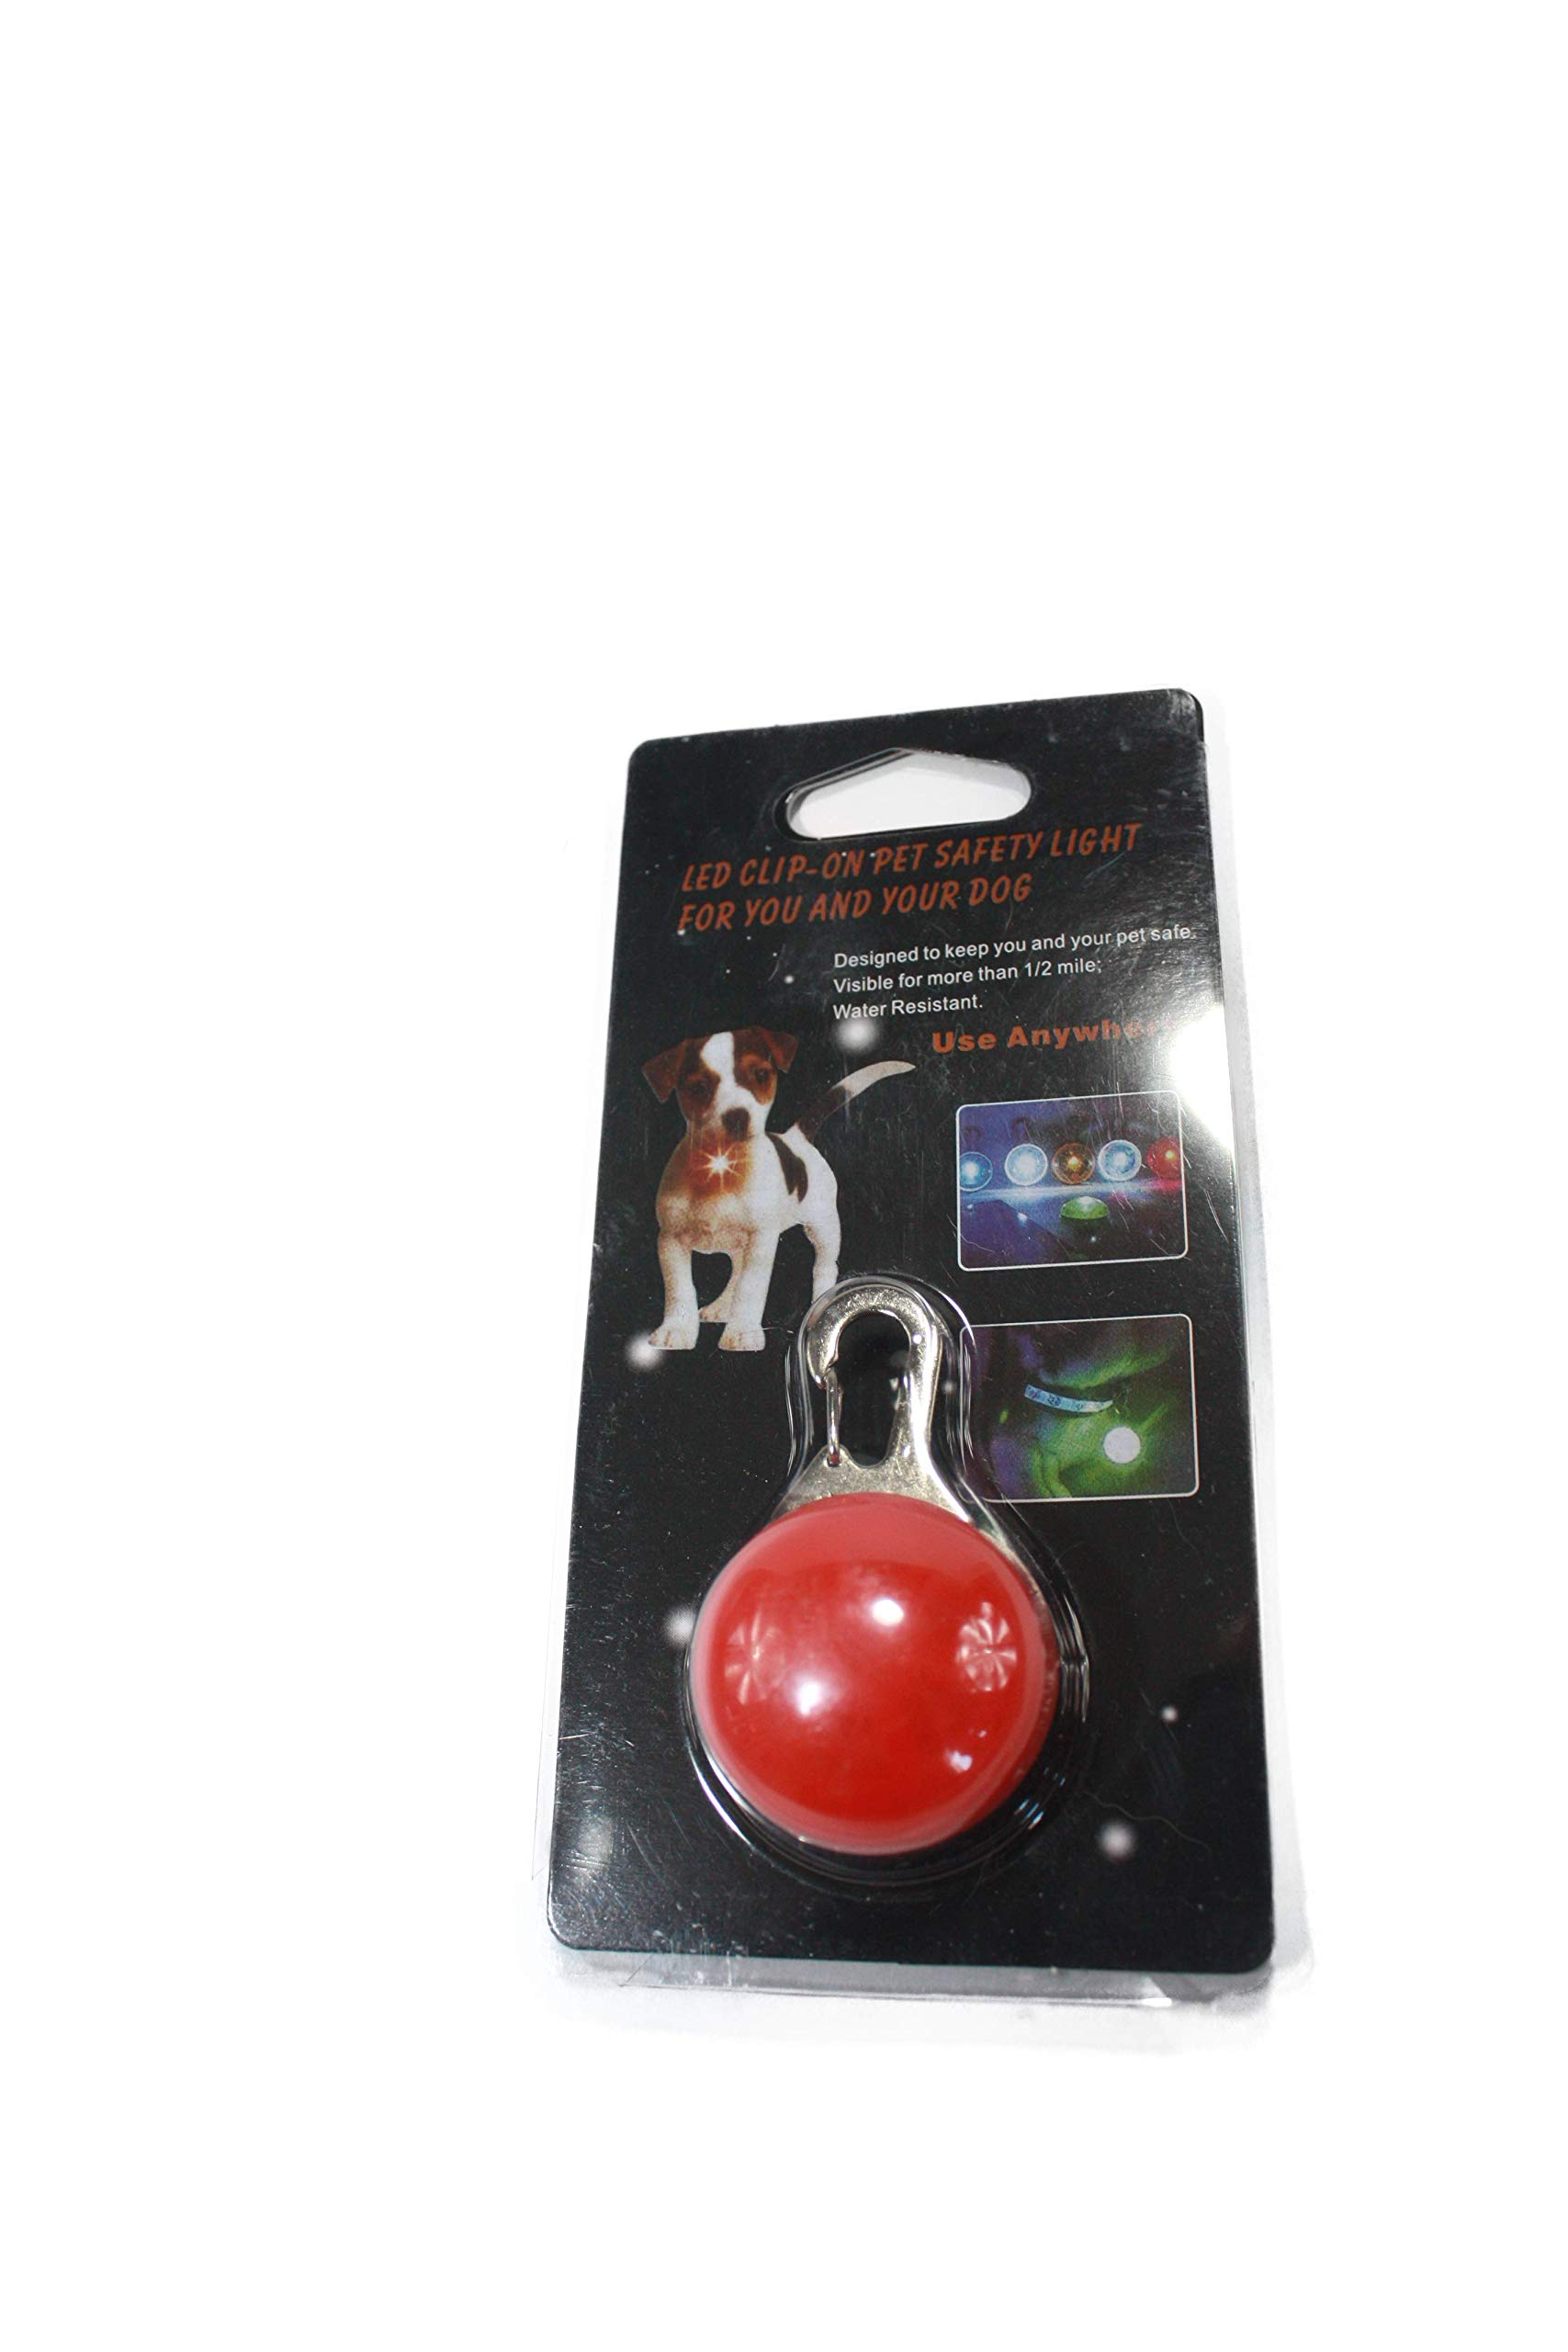 Pet Evac Pak, LLC Premium Big Dog Emergency Survival Kit - 72 Hours by Pet Evac Pak, LLC (Image #5)